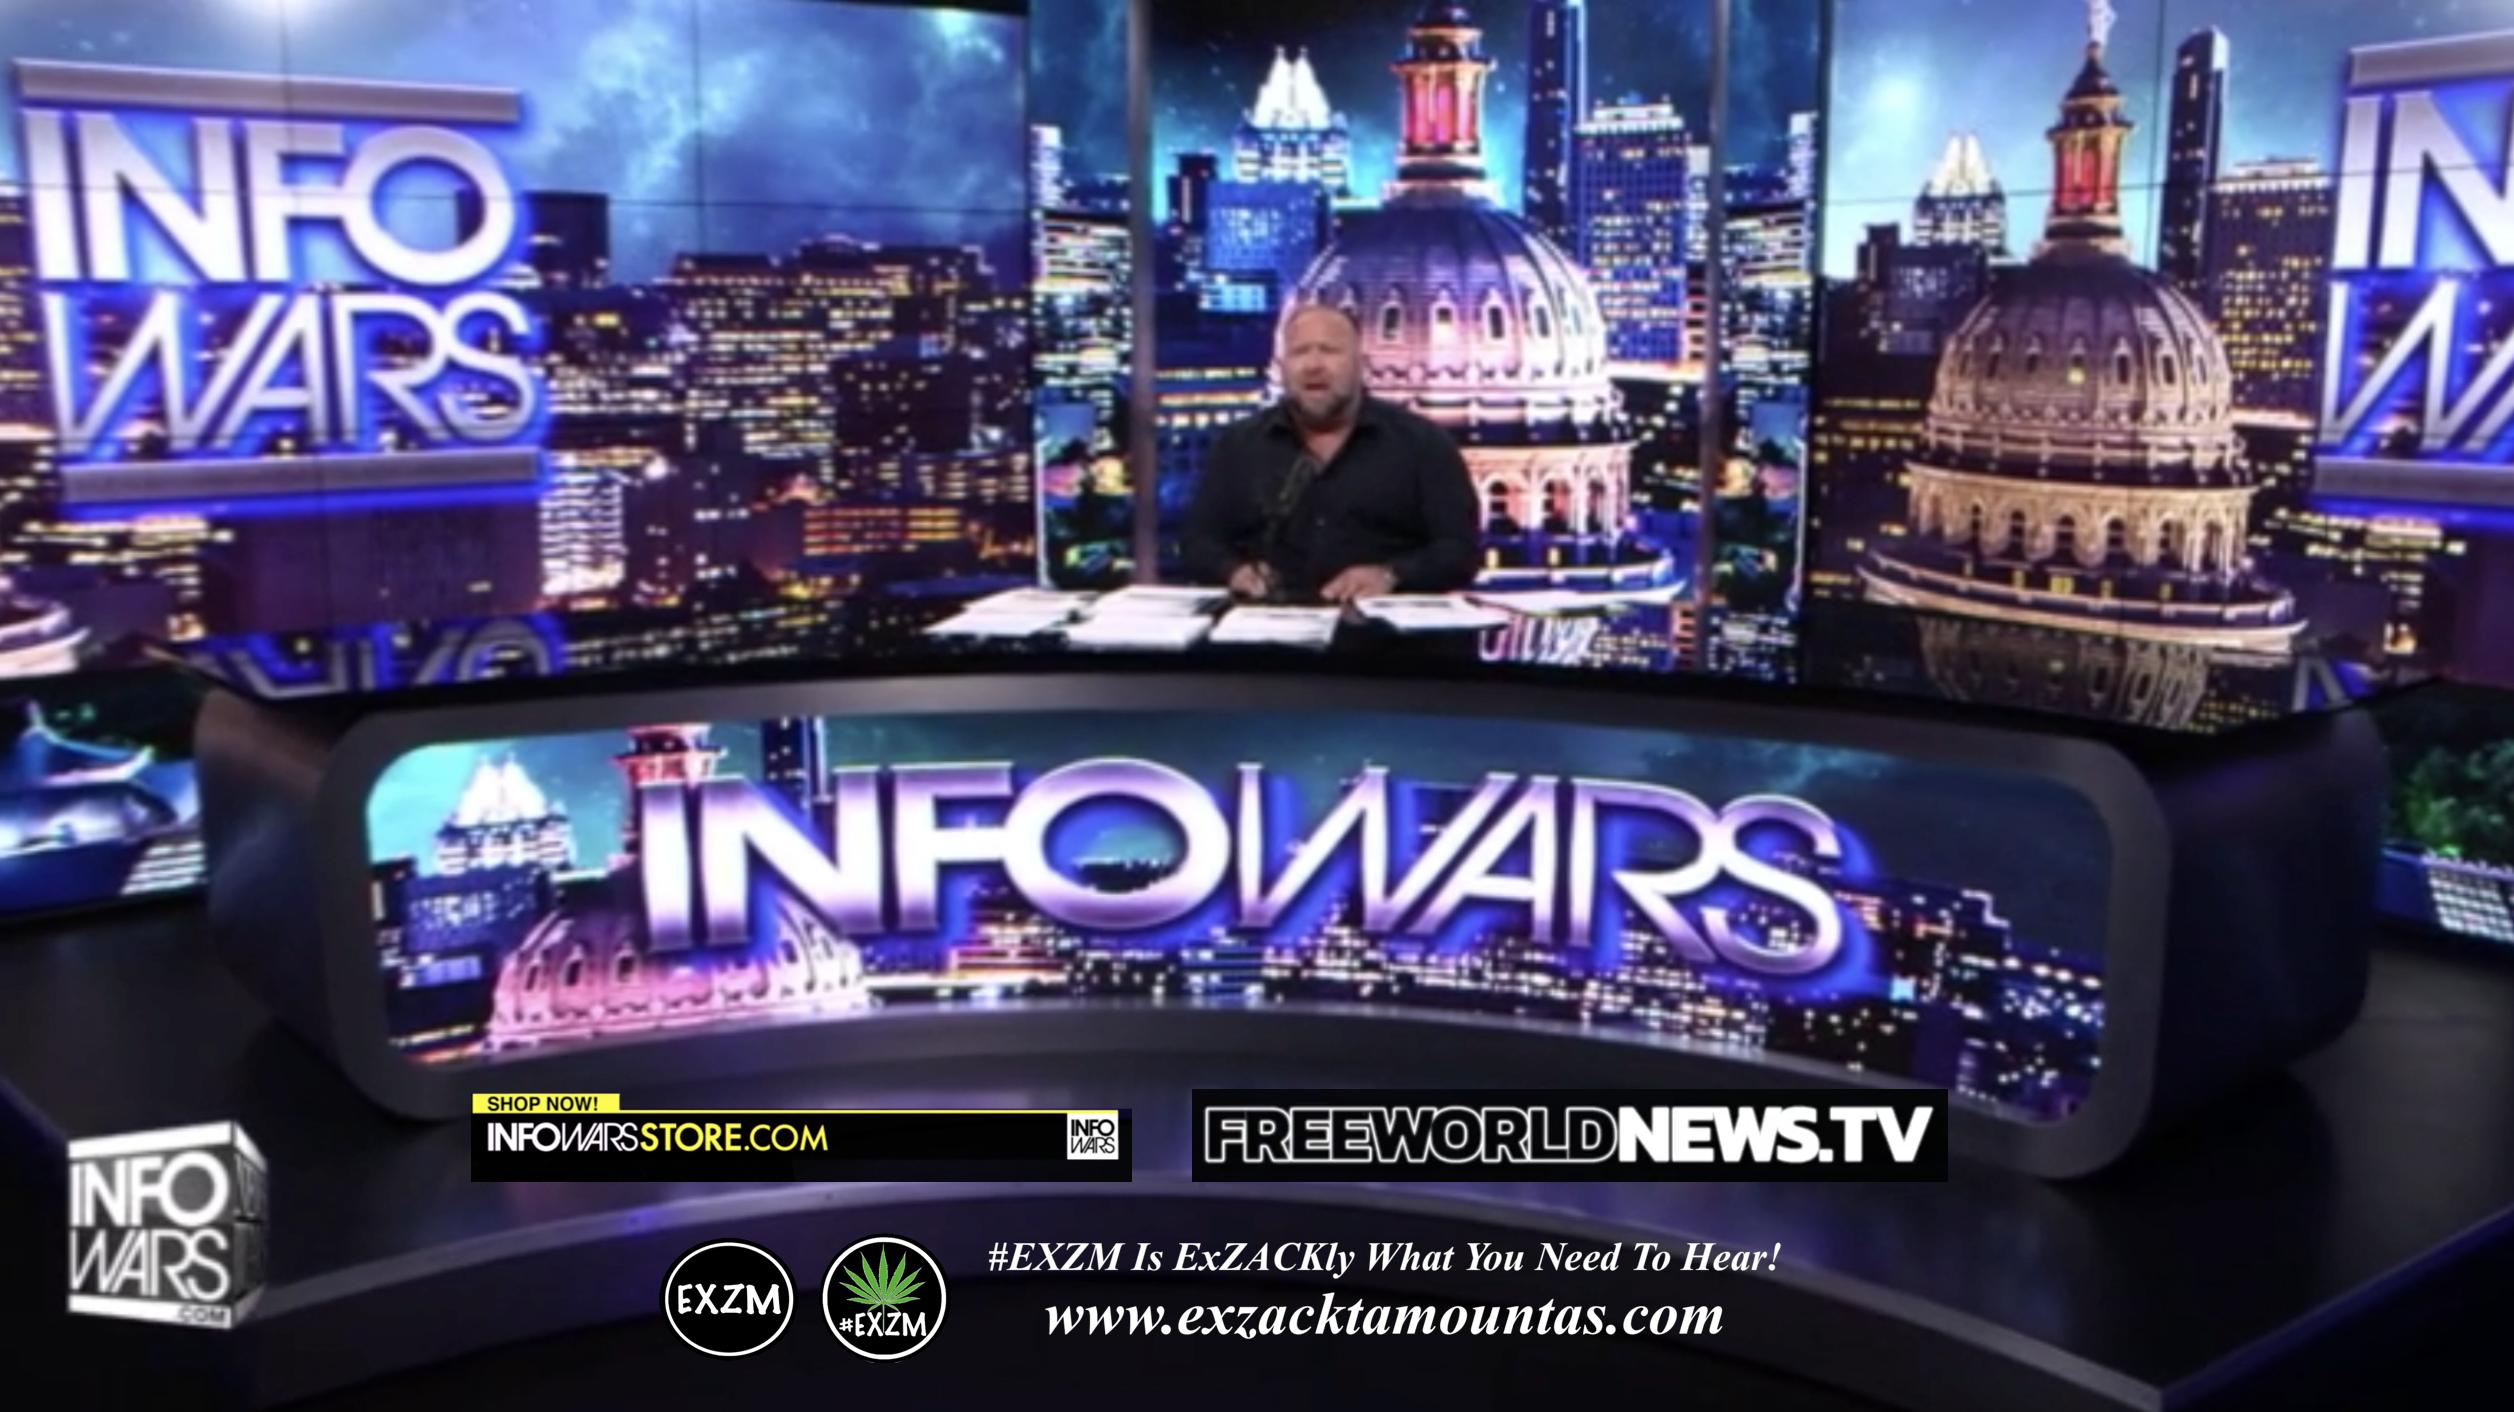 Alex Jones Live In Infowars Studio Free World News TV EXZM Zack Mount July 11th 2021 copy